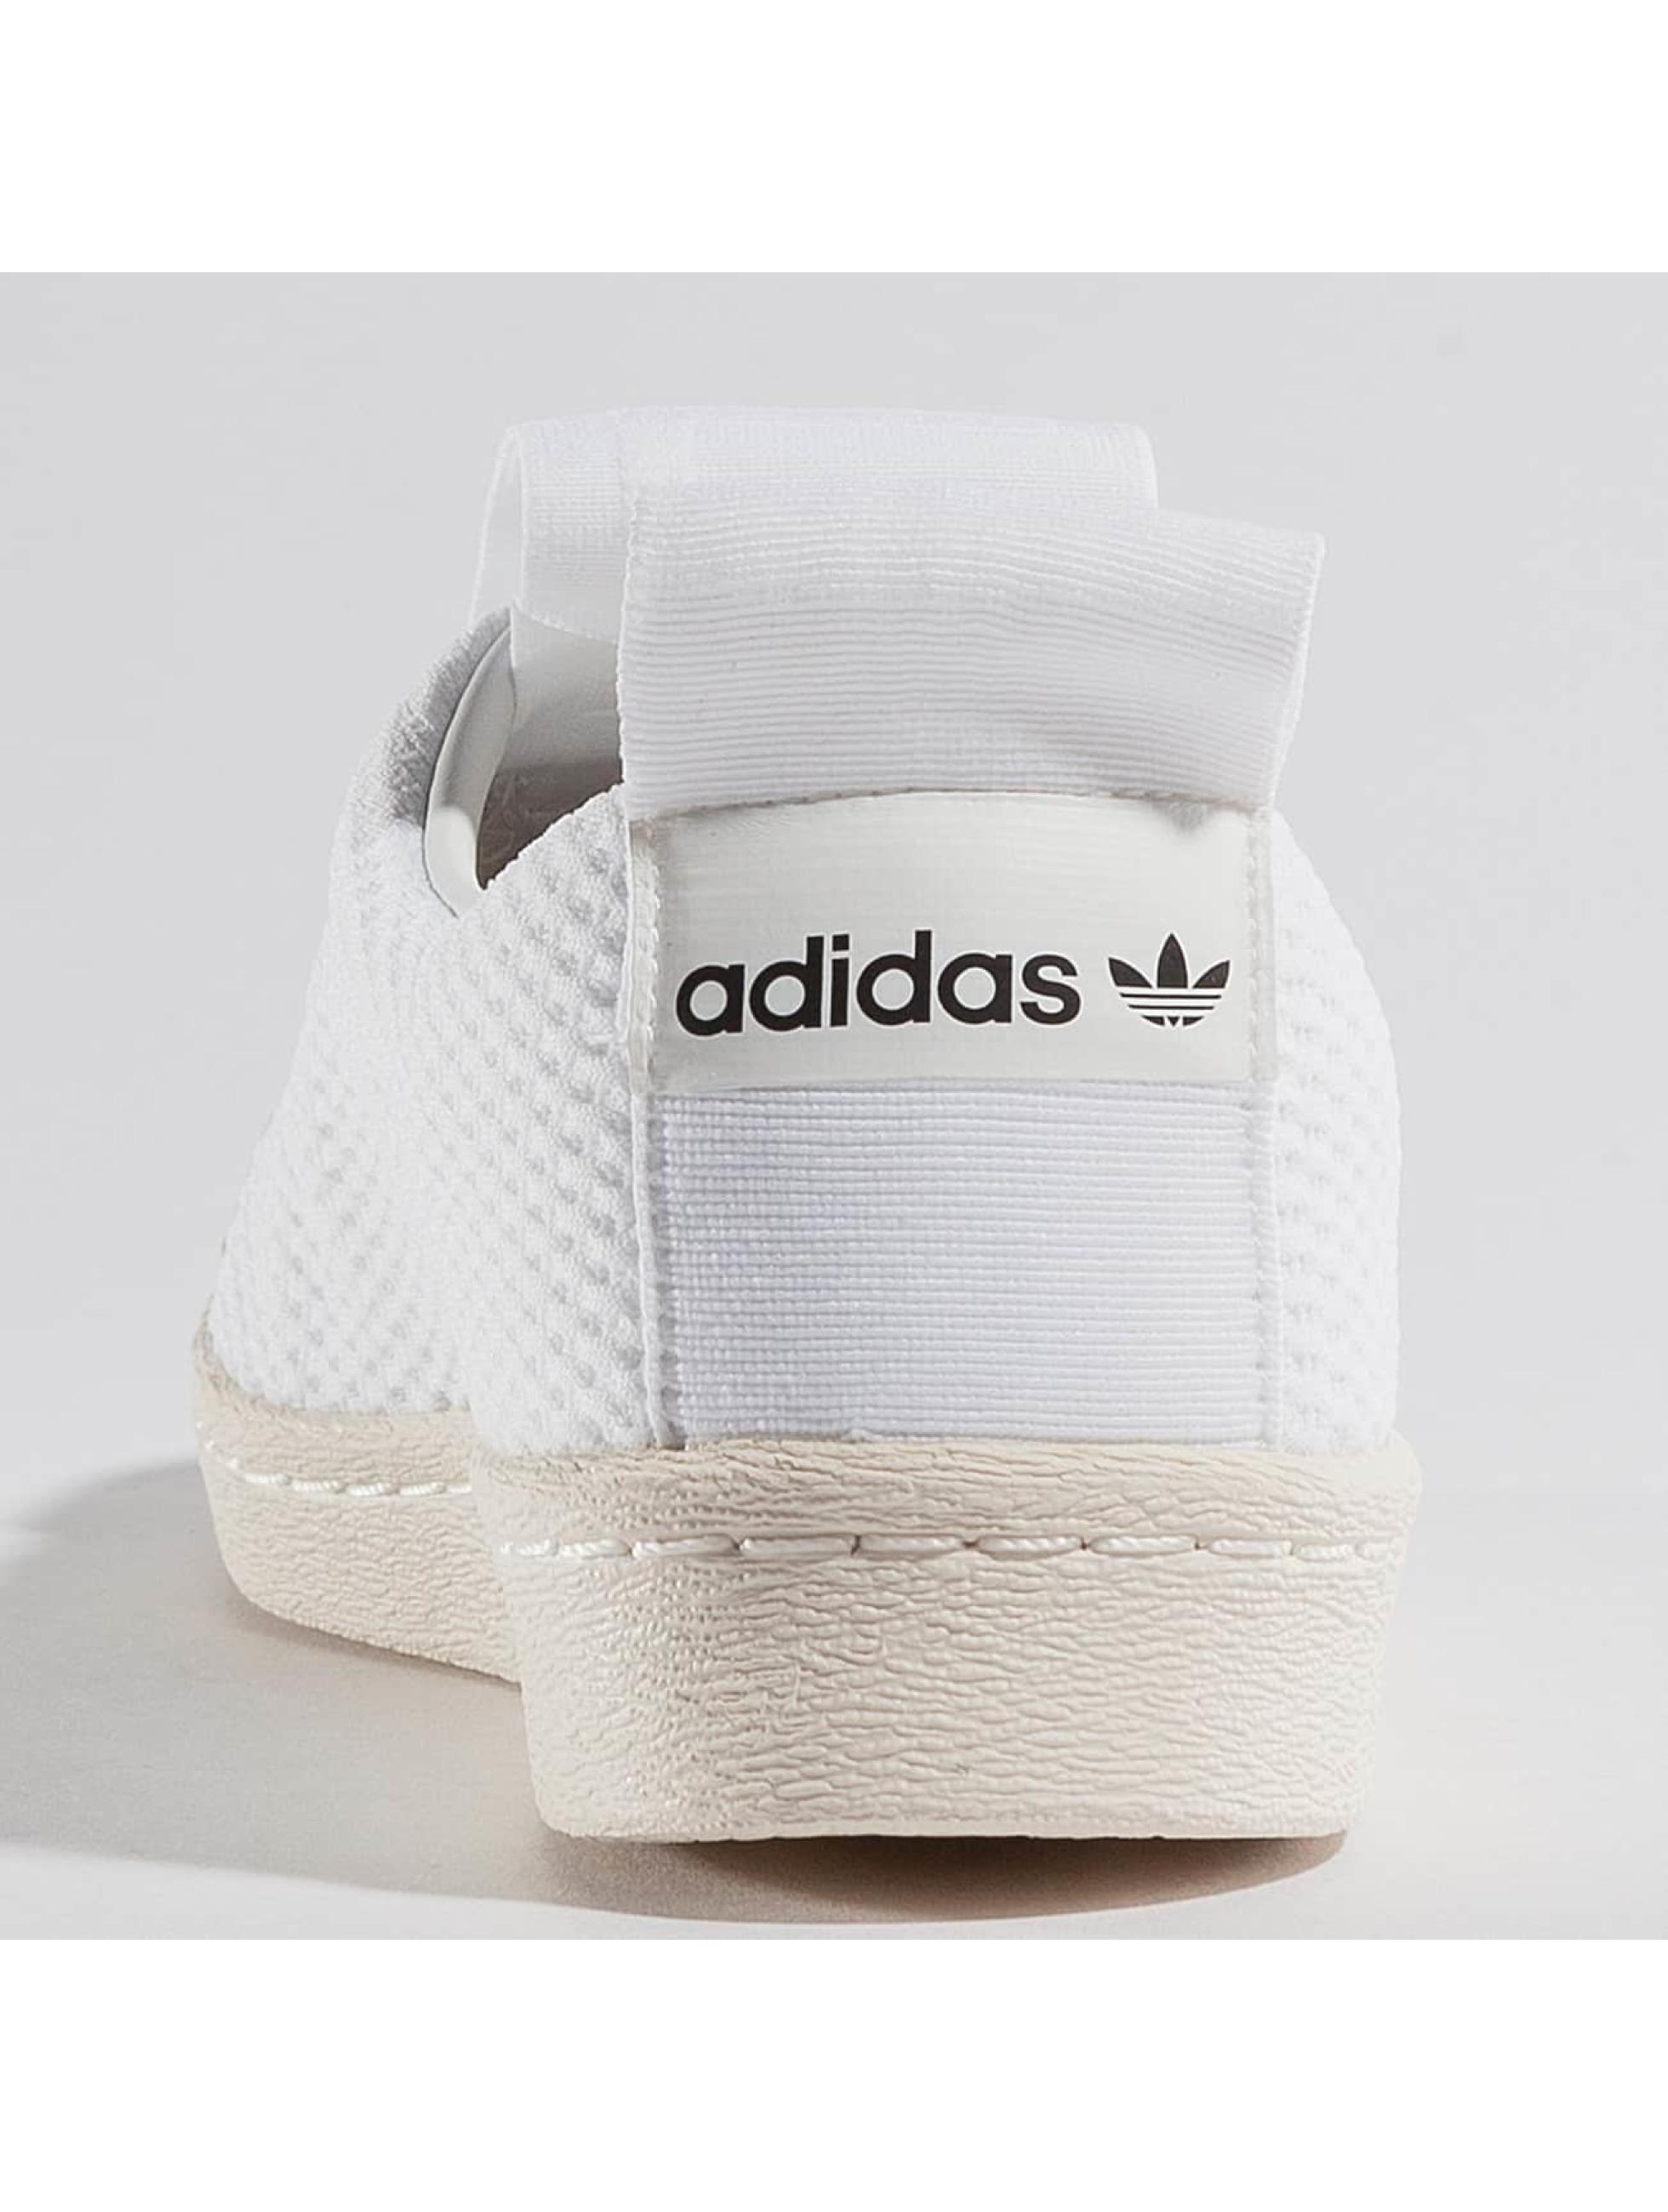 adidas Sneakers Superstar BW35 S hvid